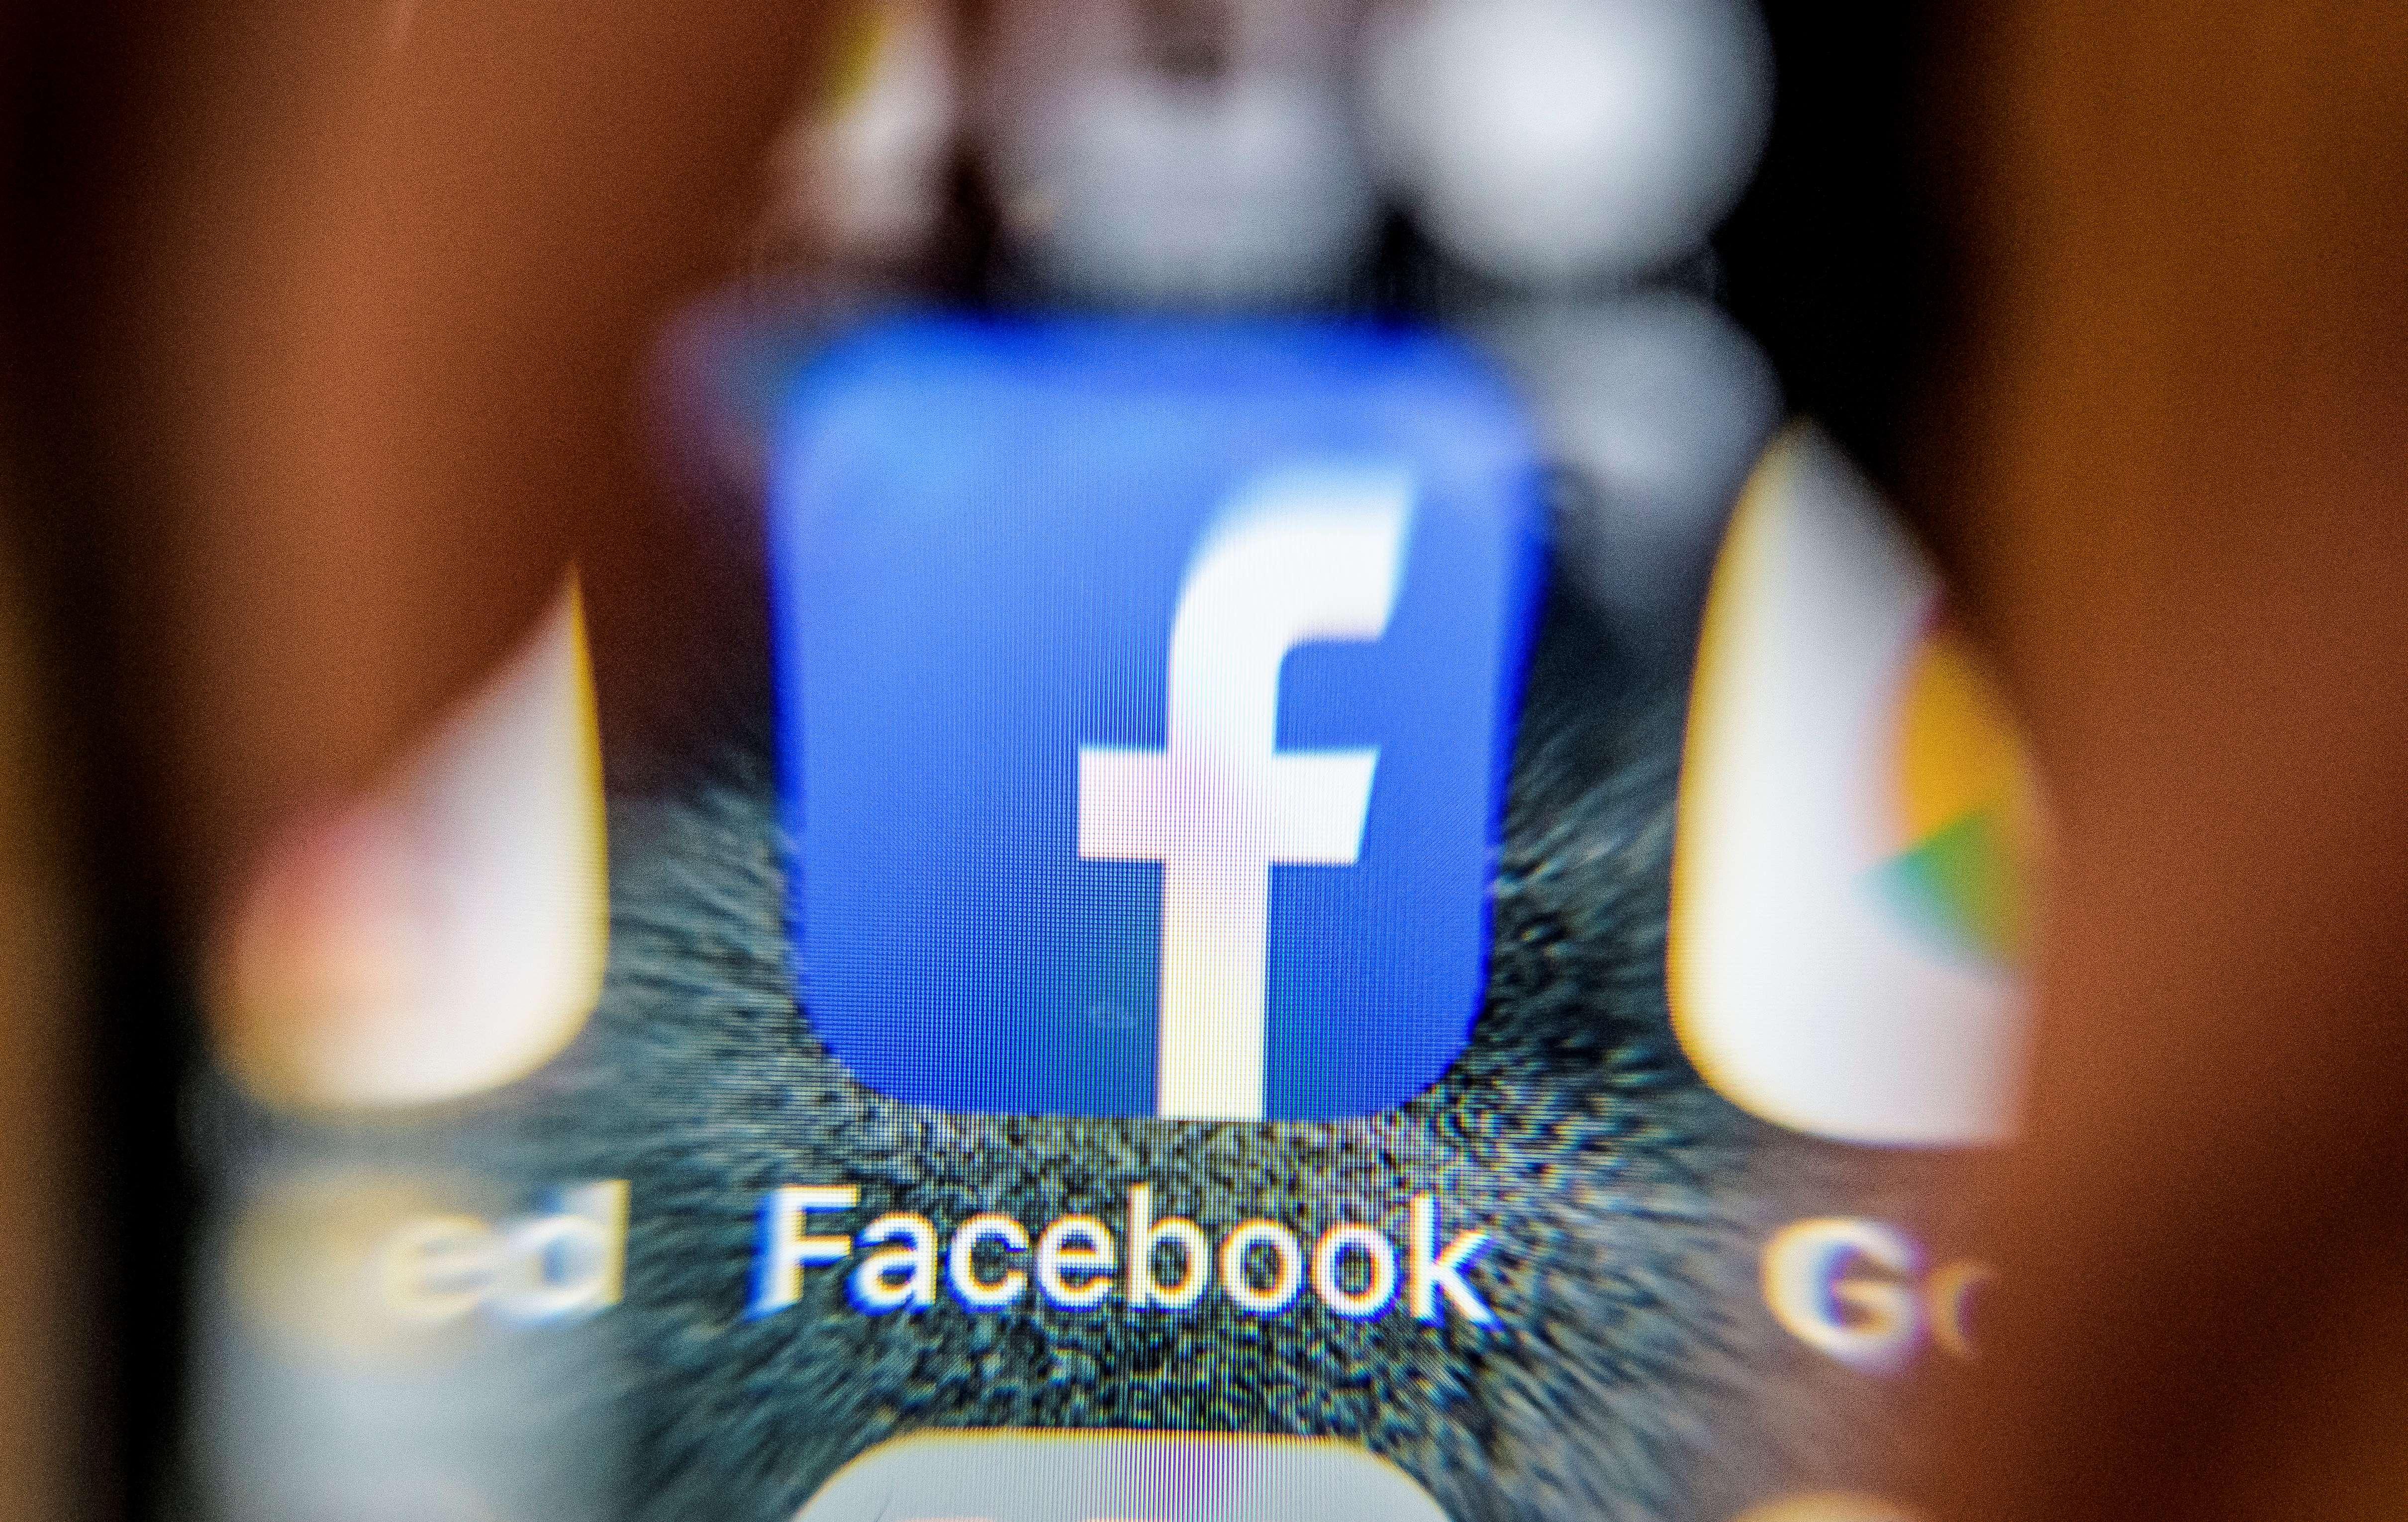 Facebook logo on smartphone